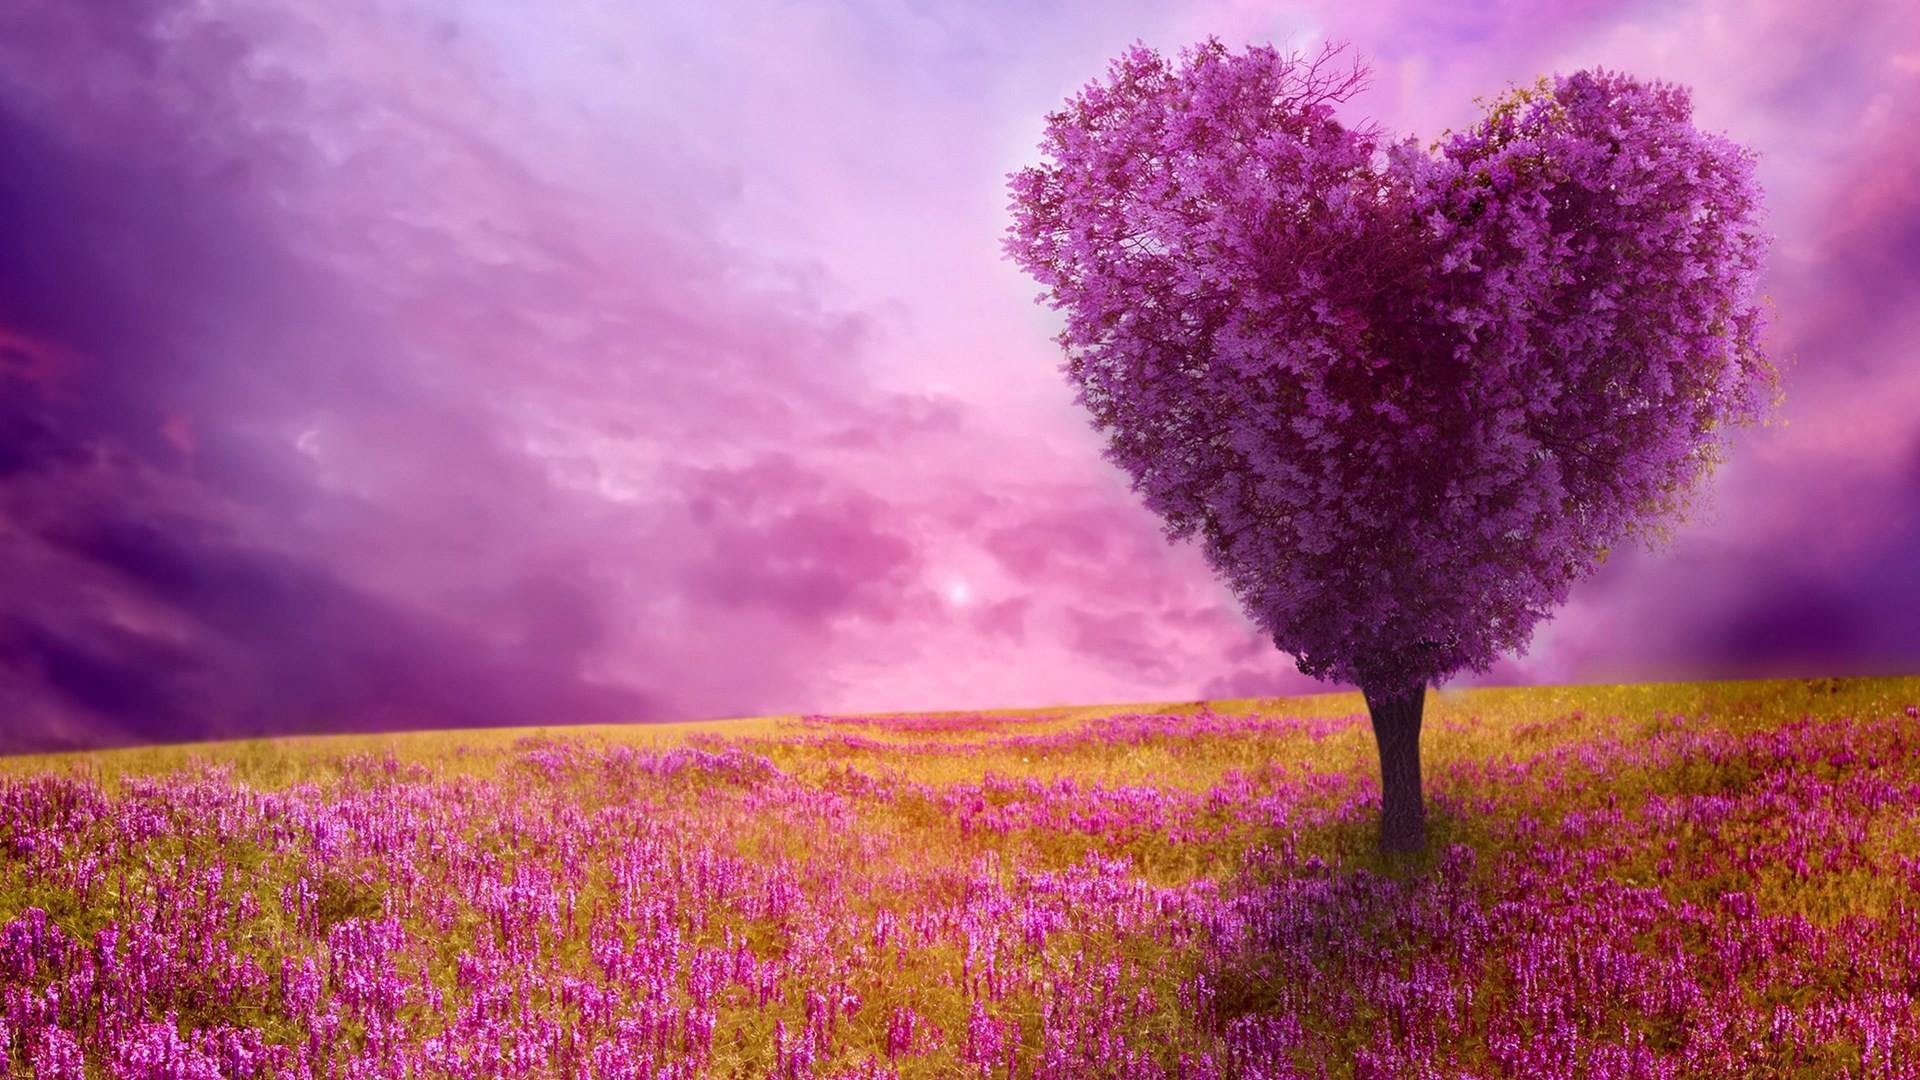 Top 10 HD Spring Season Desktop Backgrounds/Wallpapers